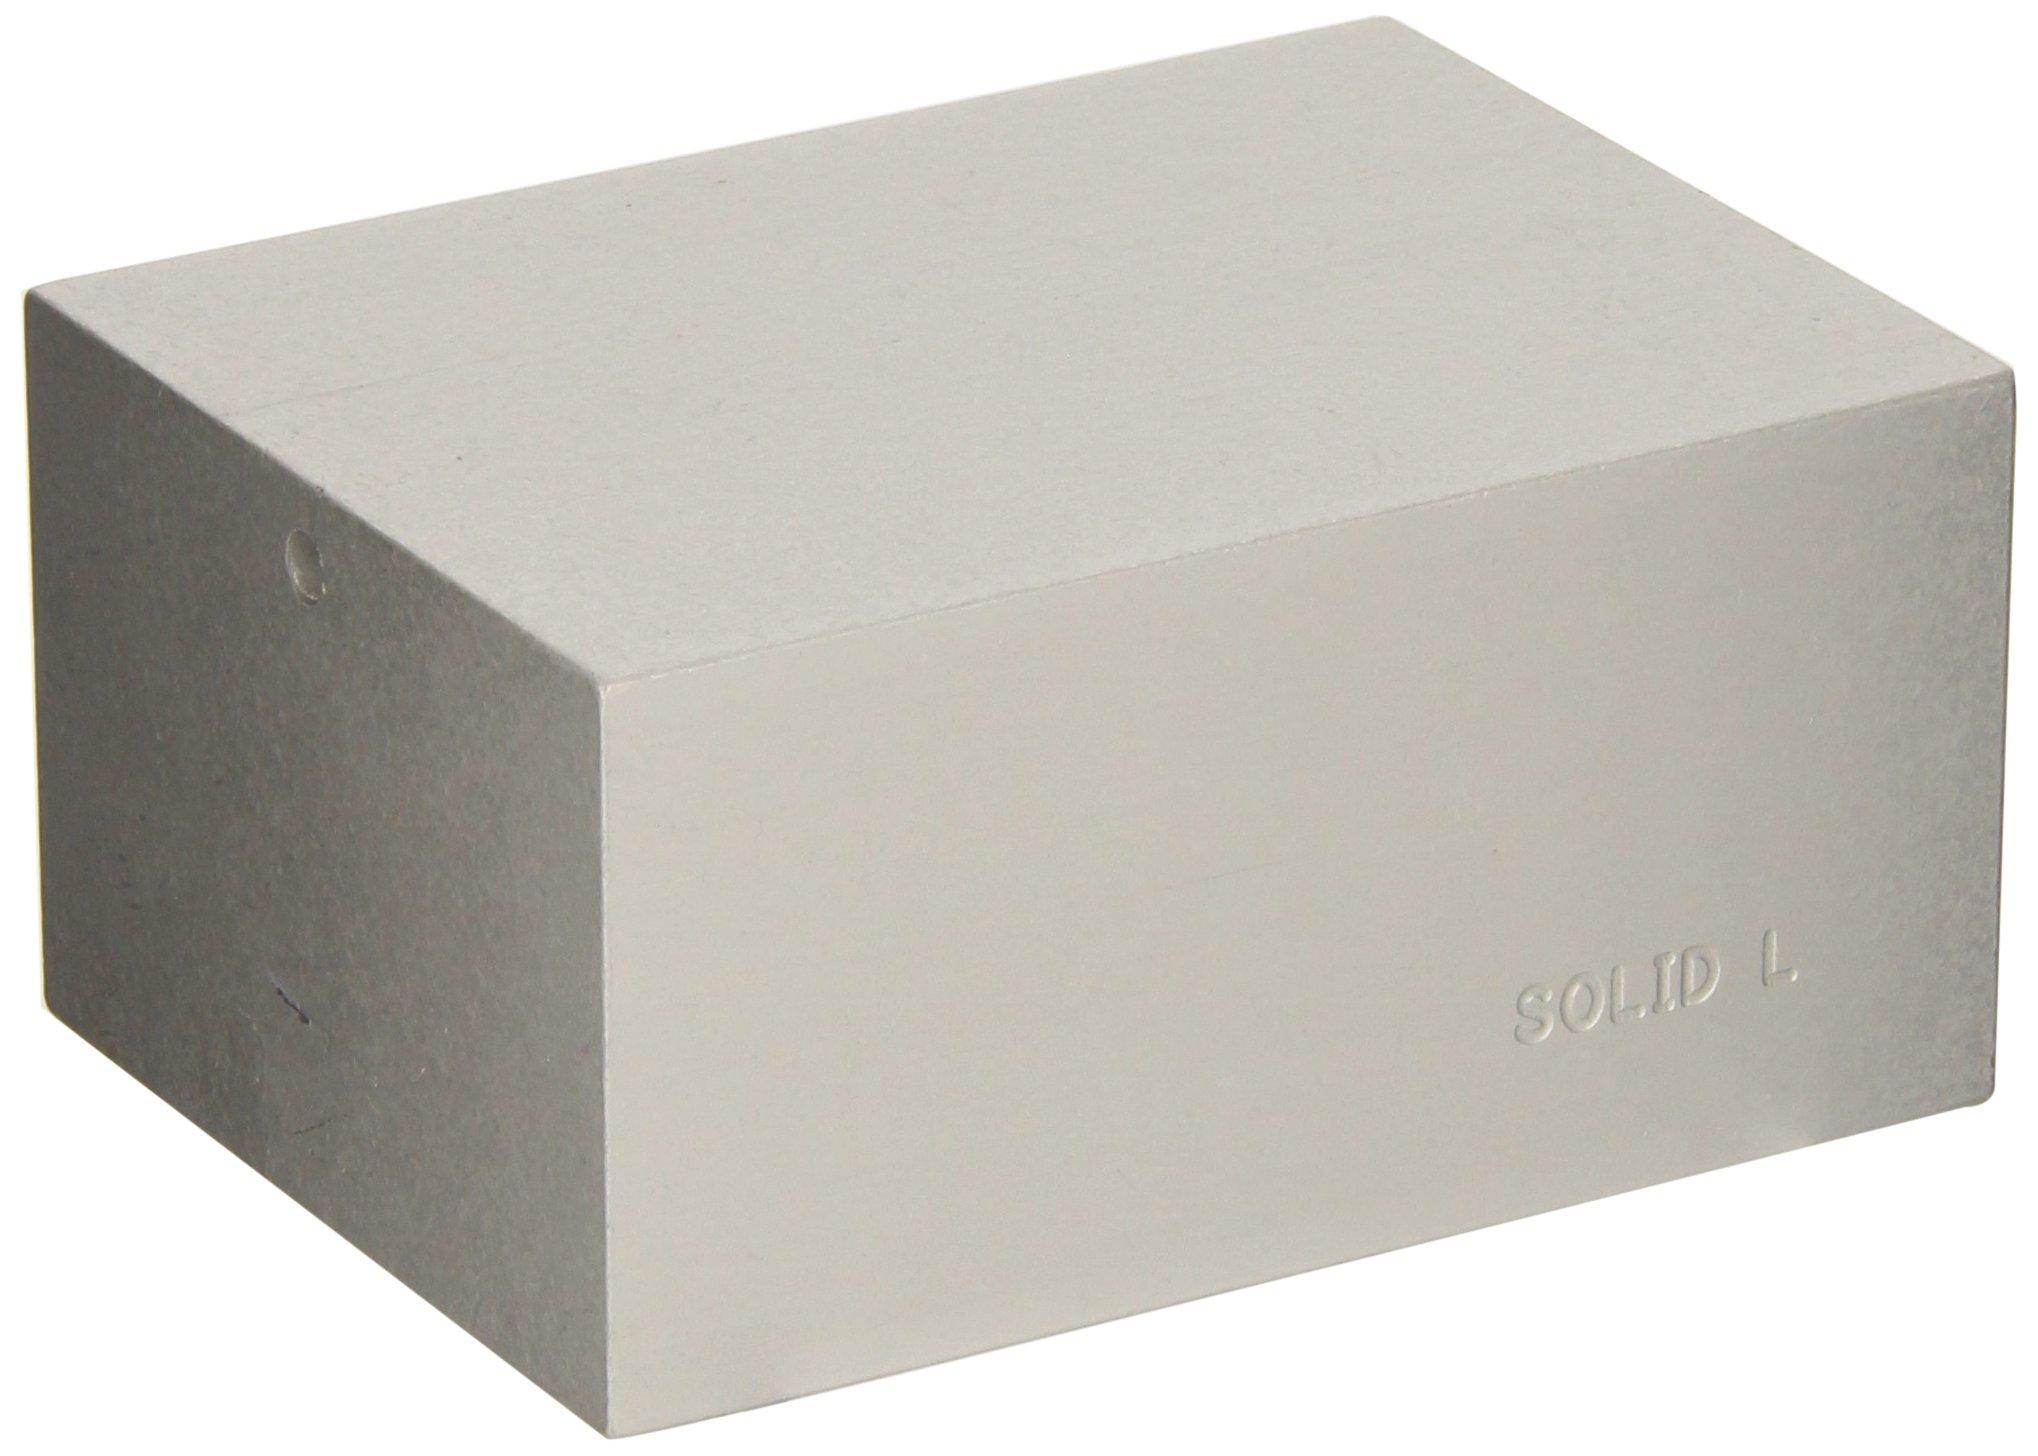 Barnstead Solid Aluminum Modular Block